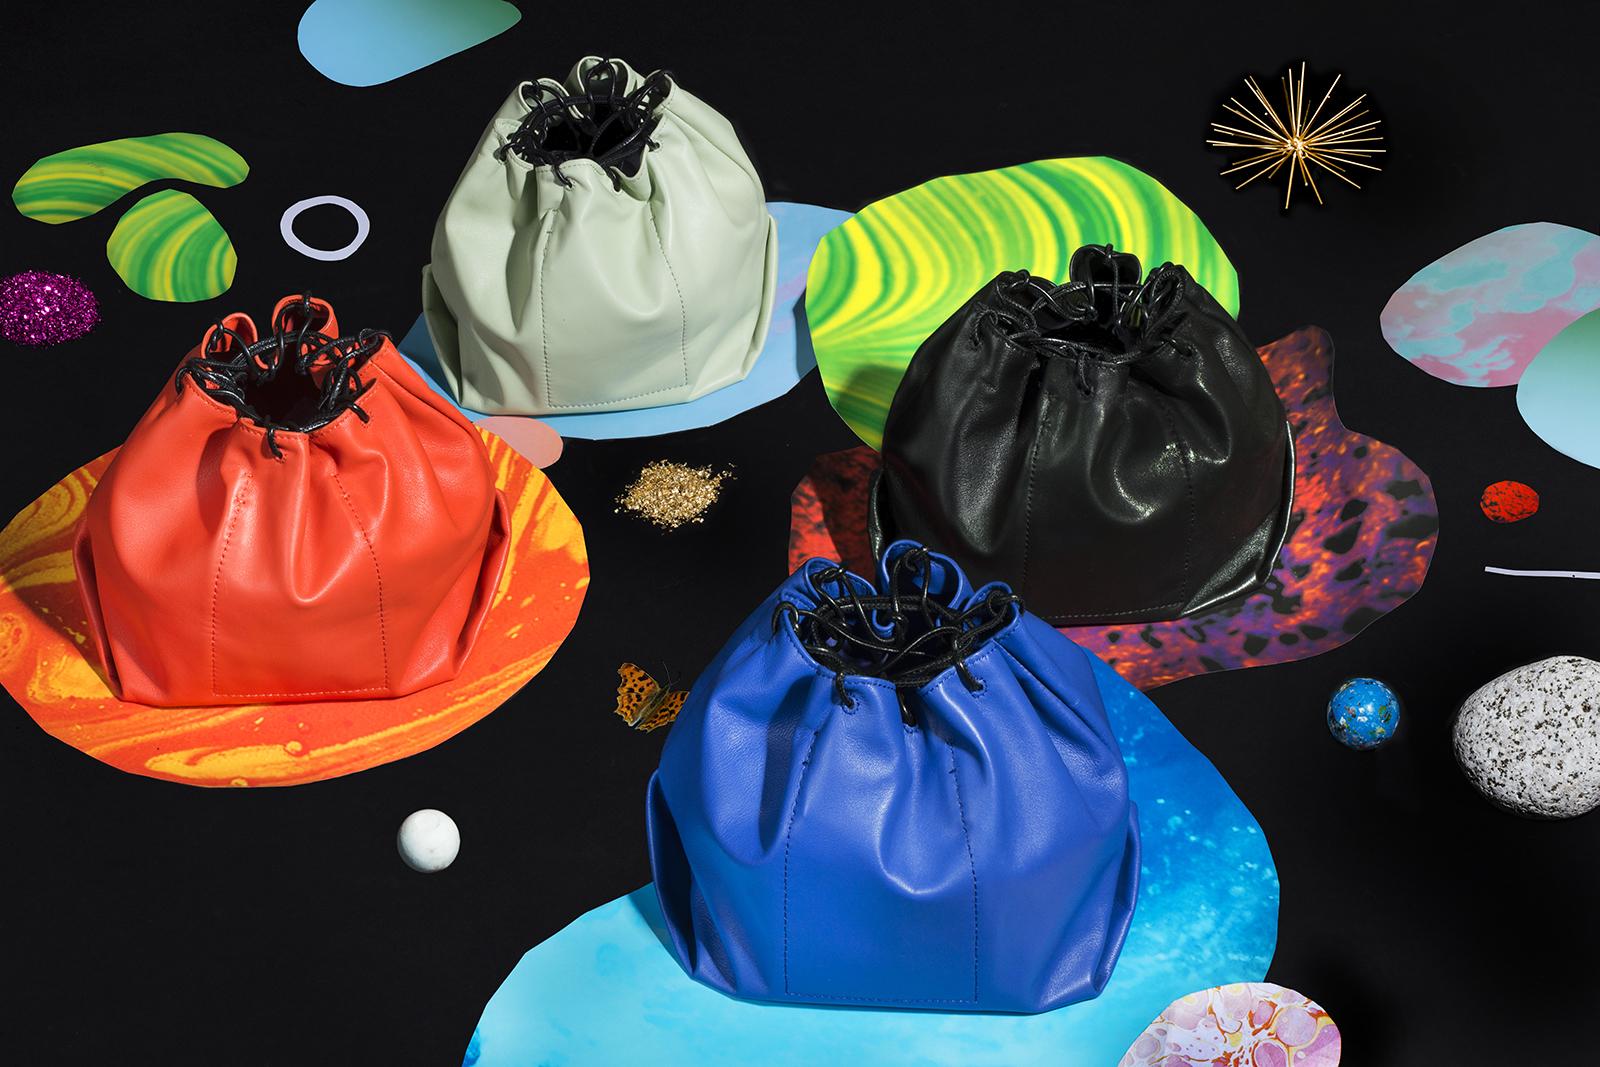 Kara - Horoscope Bags